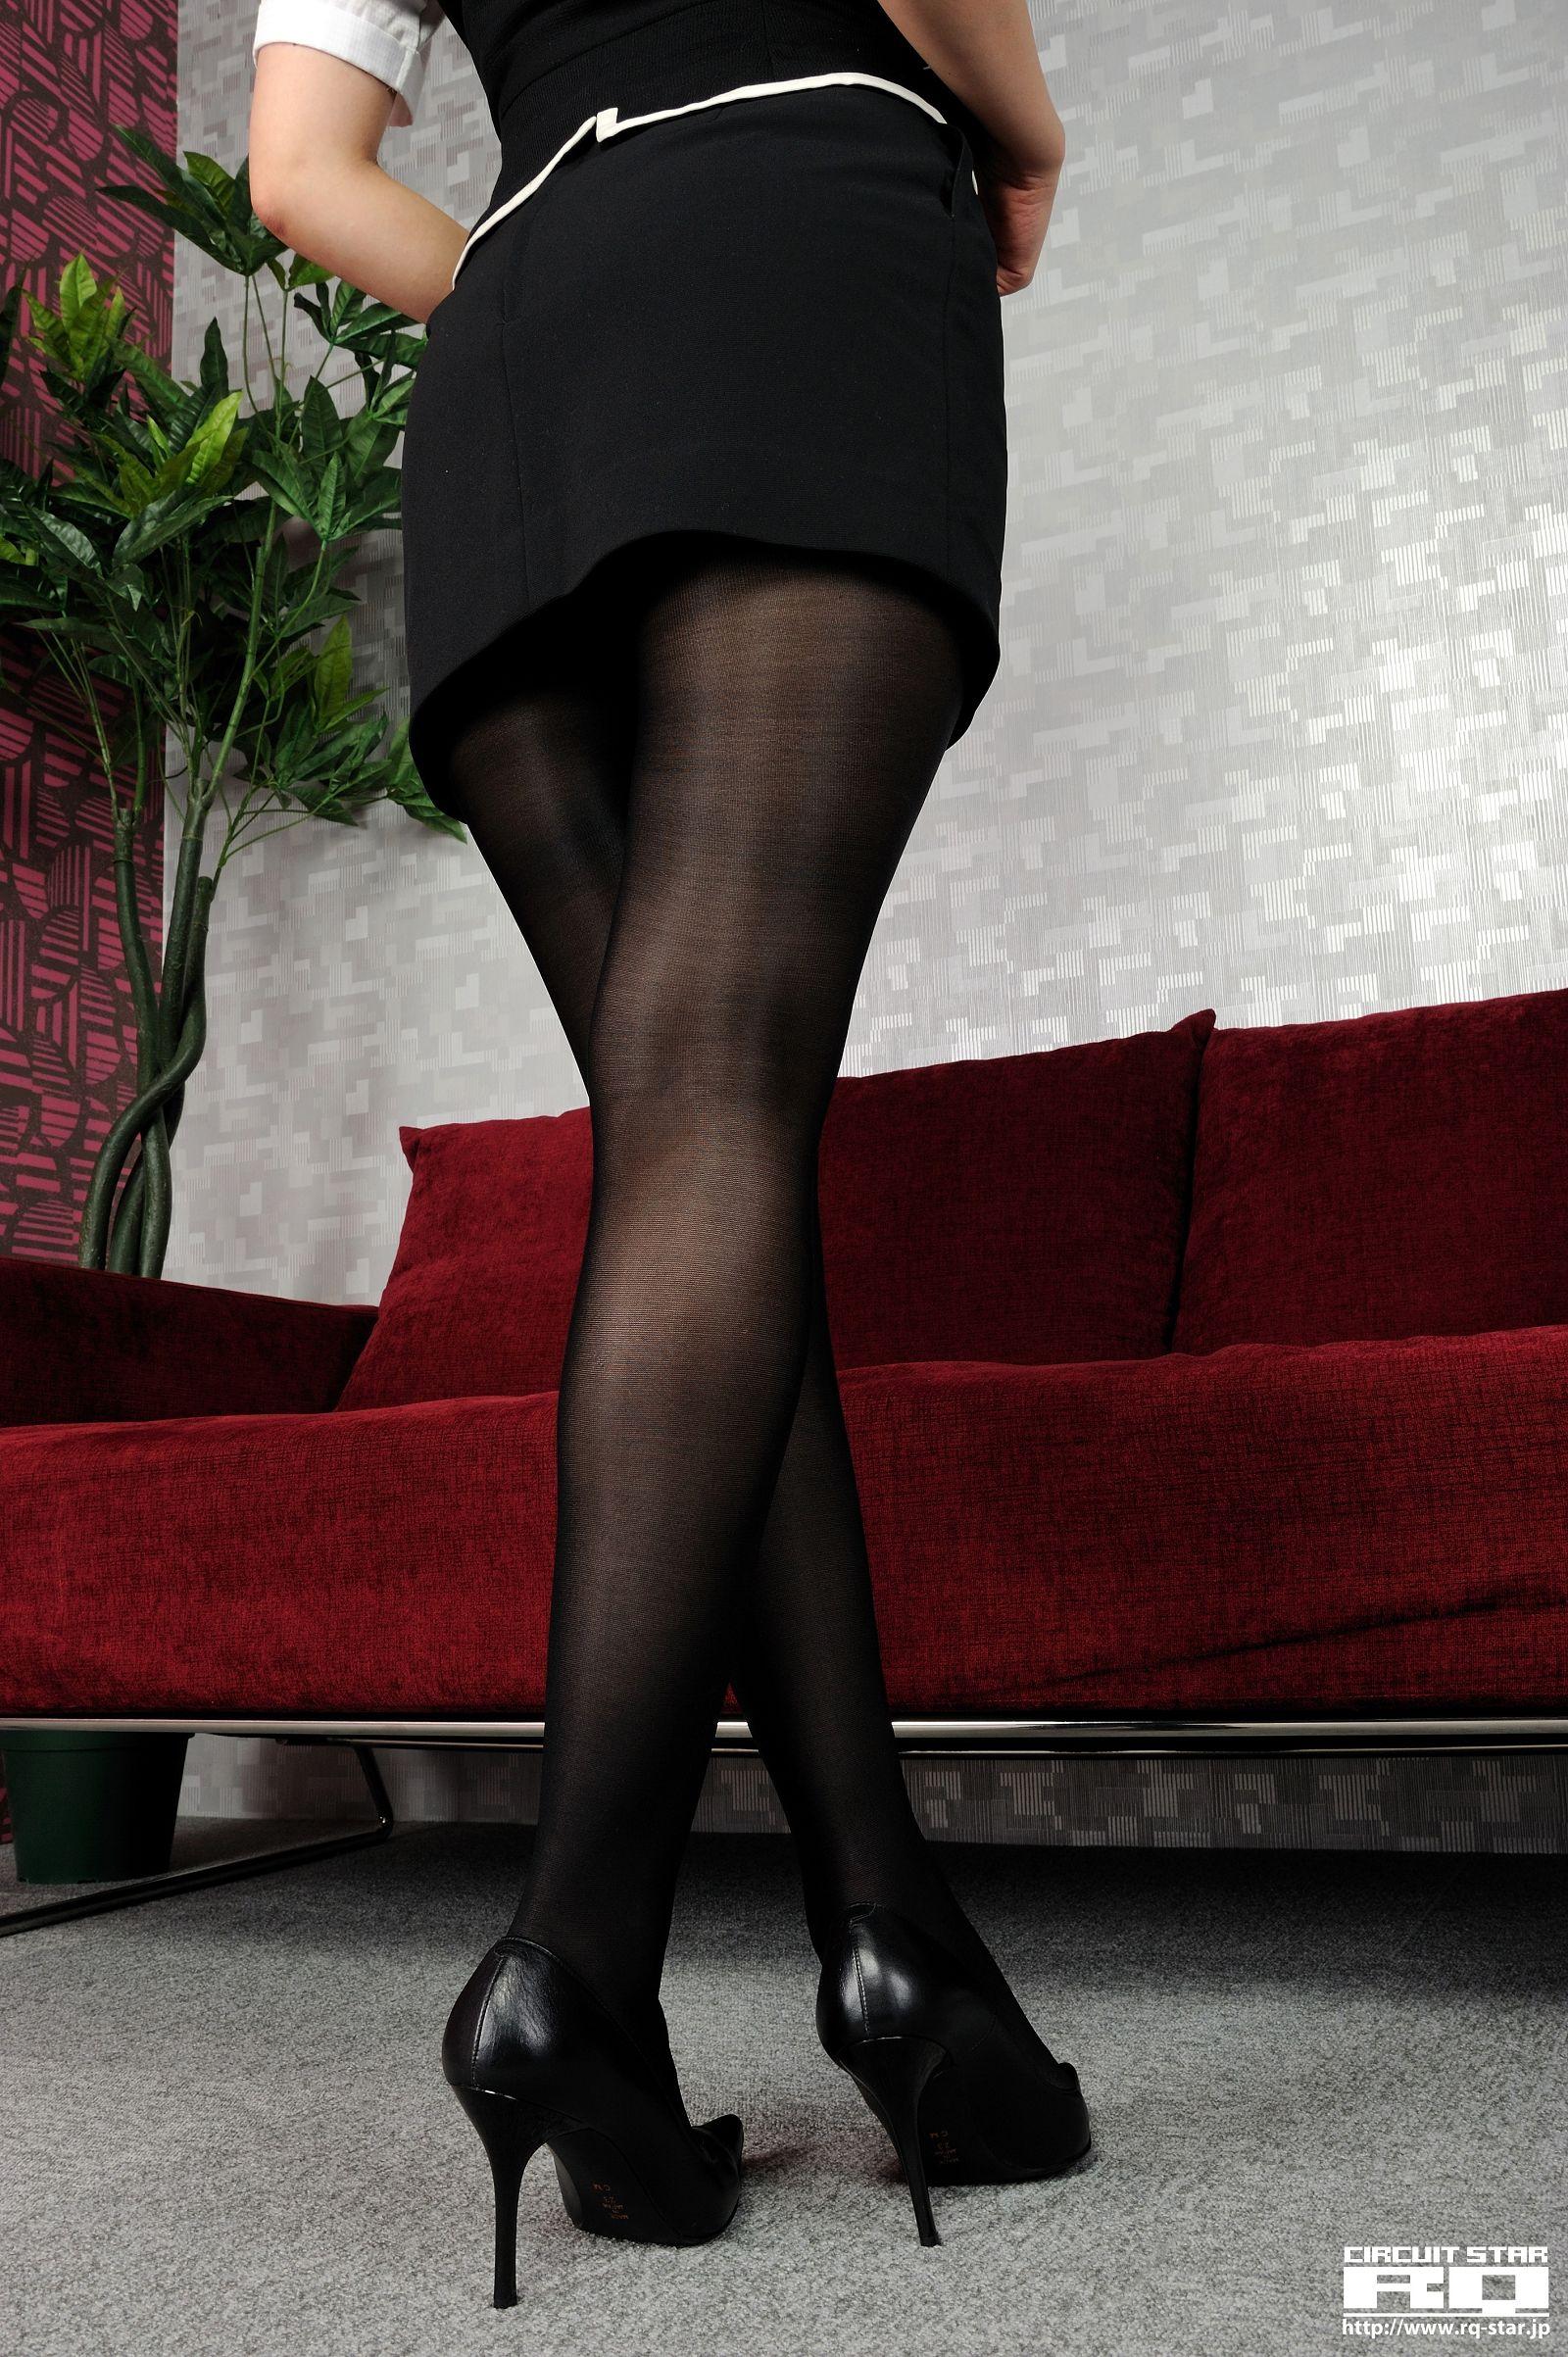 [RQ STAR美女] NO.0355 Mai Asano 浅野舞 Office Lady[88P] RQ STAR 第4张